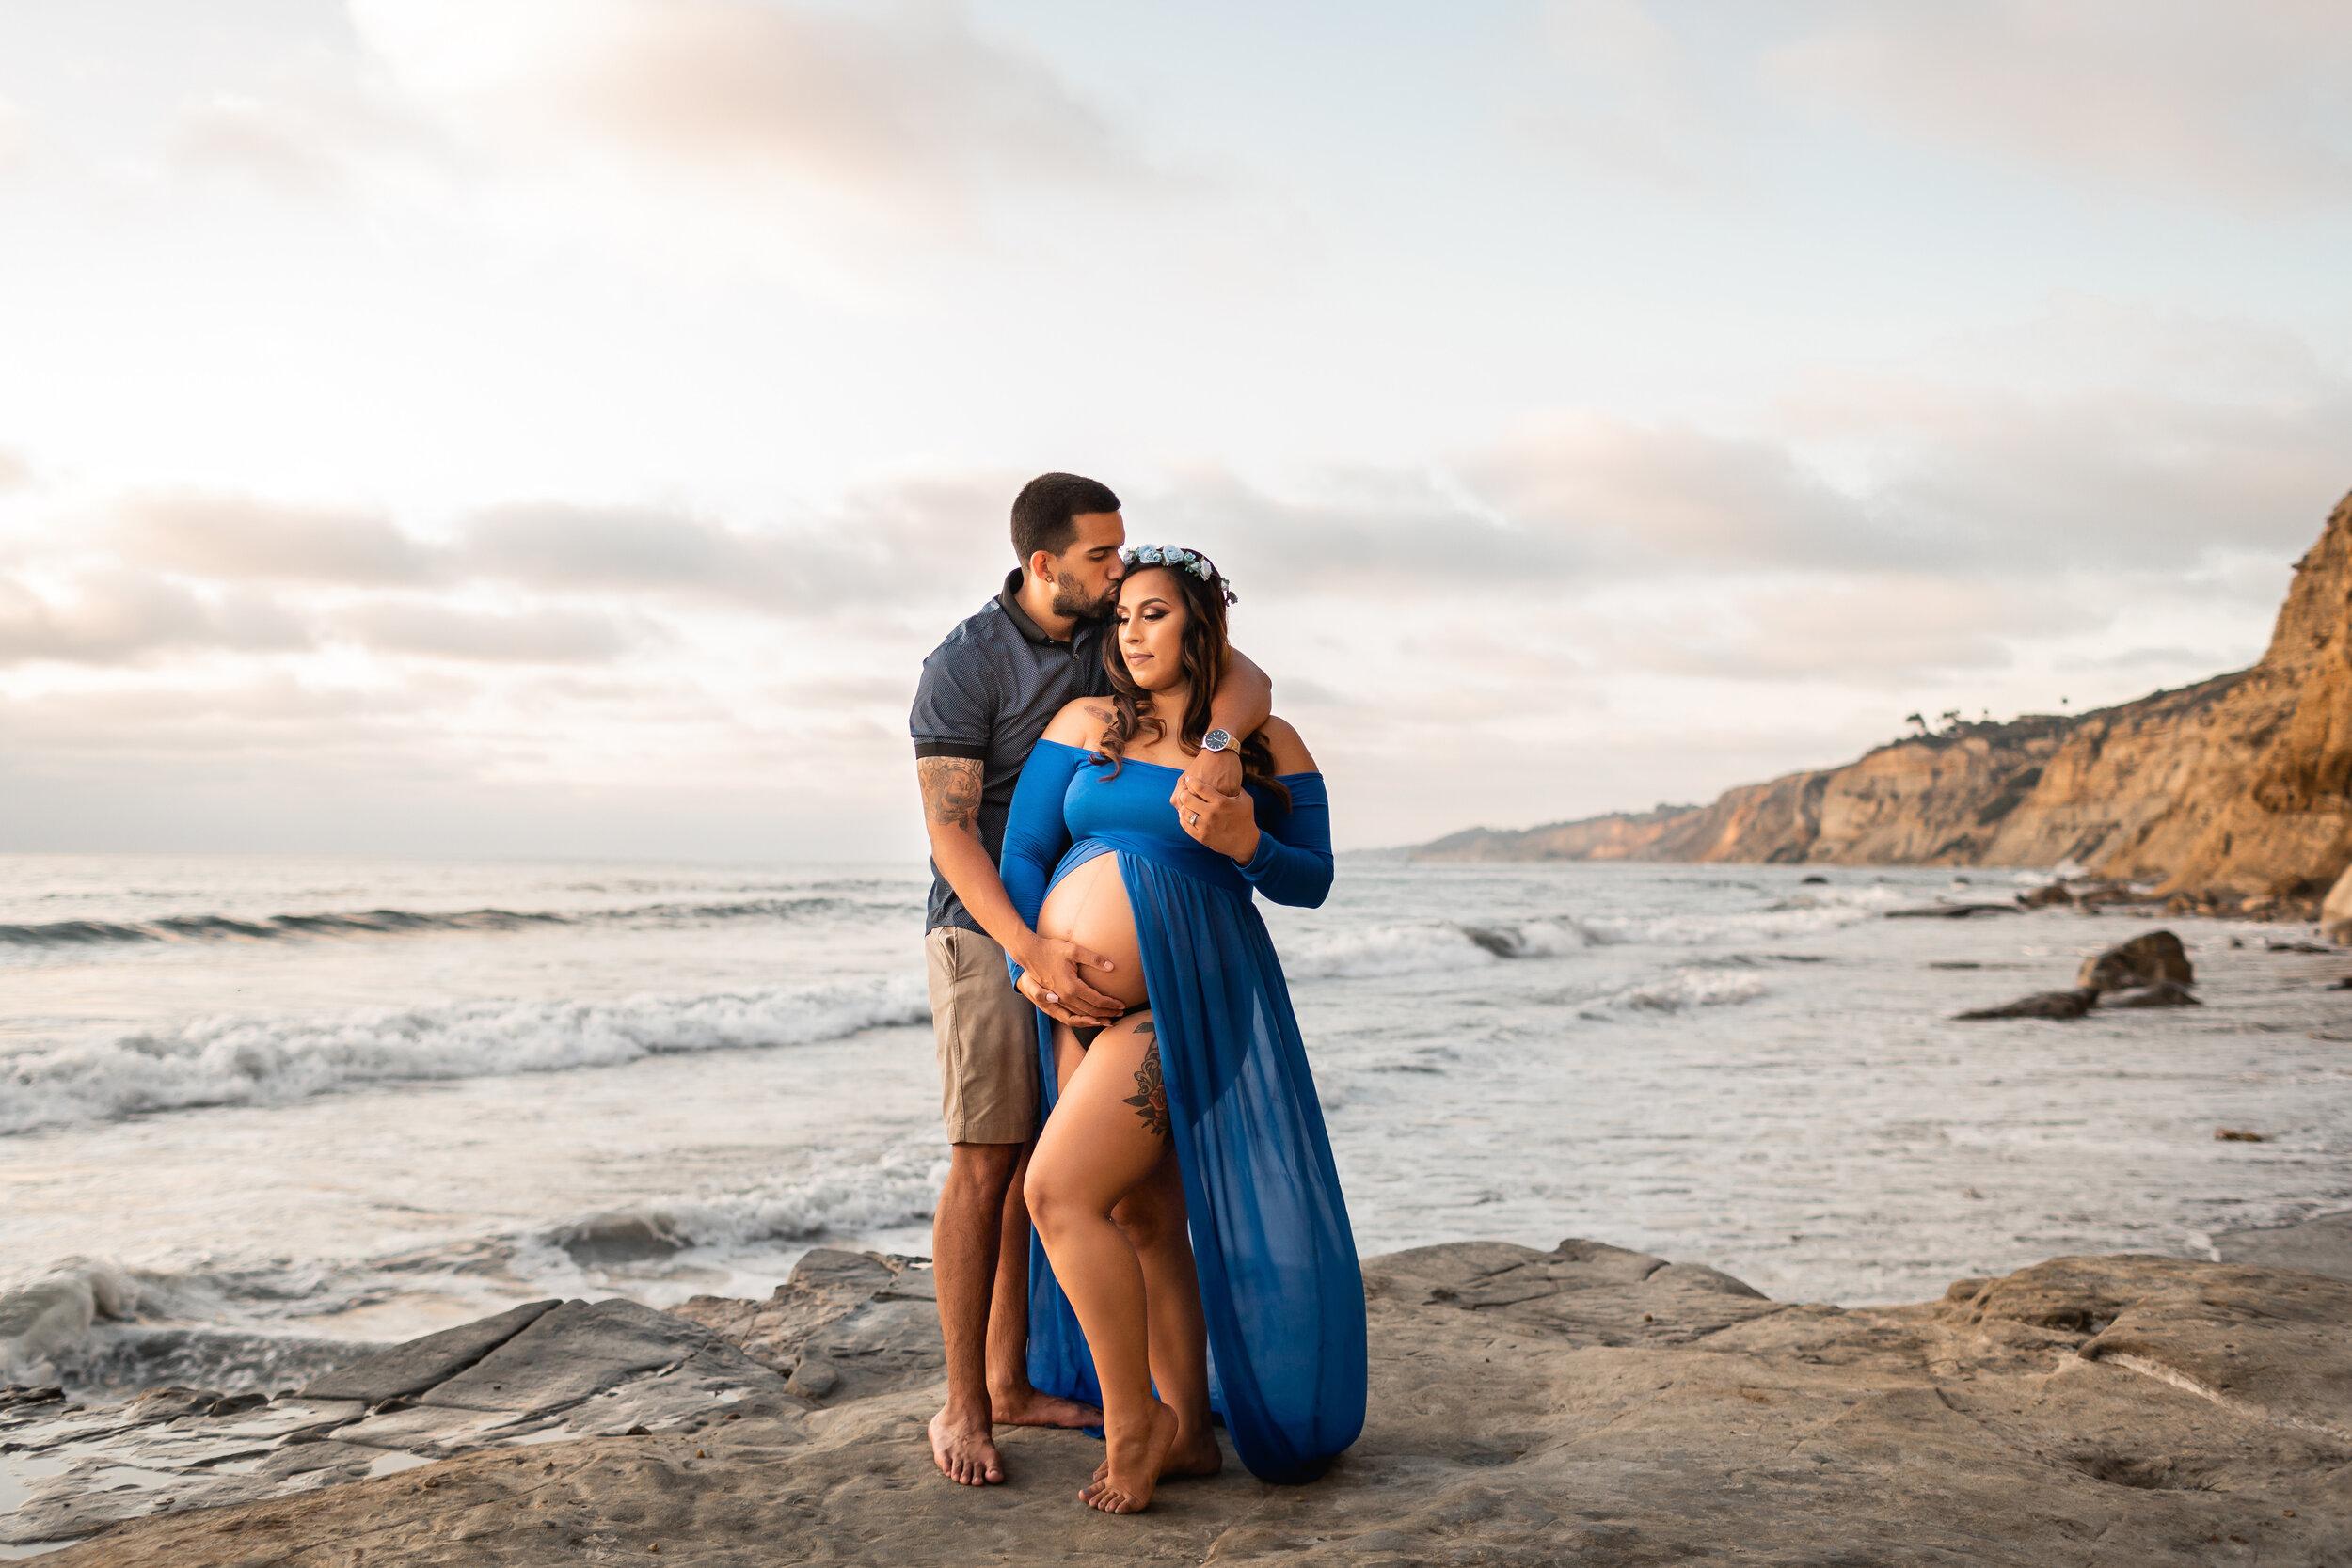 Maternity Beach Session on Rocks in San Diego, CA